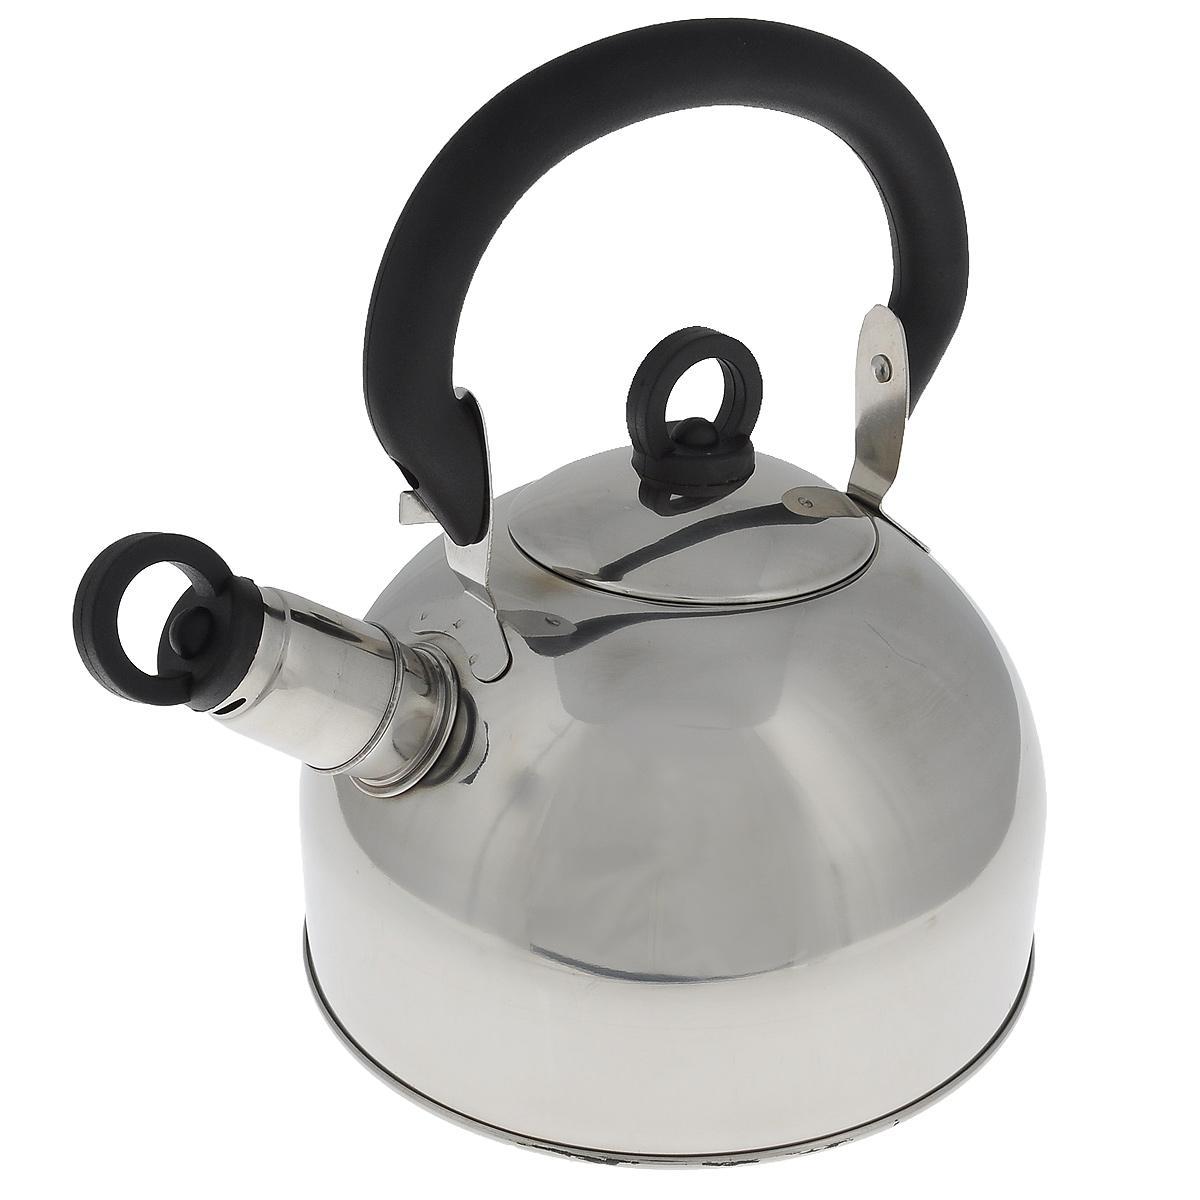 ������ Regent Inox Tea �� ��������, 1,8 �. 93-TEA-25 - Regent Inox93-TEA-25������ Regent Inox Tea �������� �� ������������������ ����������� ����� 18/10 � ���������� ����������. �������� �����������: - ����������� ����������� ������� ��� � ������ ������, ��� ������������ ����������� ������������� �����, �������� ������������ � ������������ � ����������, - ���������� � ���� ���� �������� ������� � ��������������, - ������������ ��������������� ���: ������������ �����, ������������ �������� ��������� � ������������� ���� ���� ��� ��������� �������� ��������, - ������������, ����������, �����������, � ��������� ������������� ������� ������ ������ ���������� ����� �����. ������ ������� ������� � ������� ������������� ����������� ������. ������� ������� �� ������ ������� ������ ���������, ����� ���� ��������. �������� ��� ���� ����� ����, ������� ������������. ����� ���� � ������������� ������.